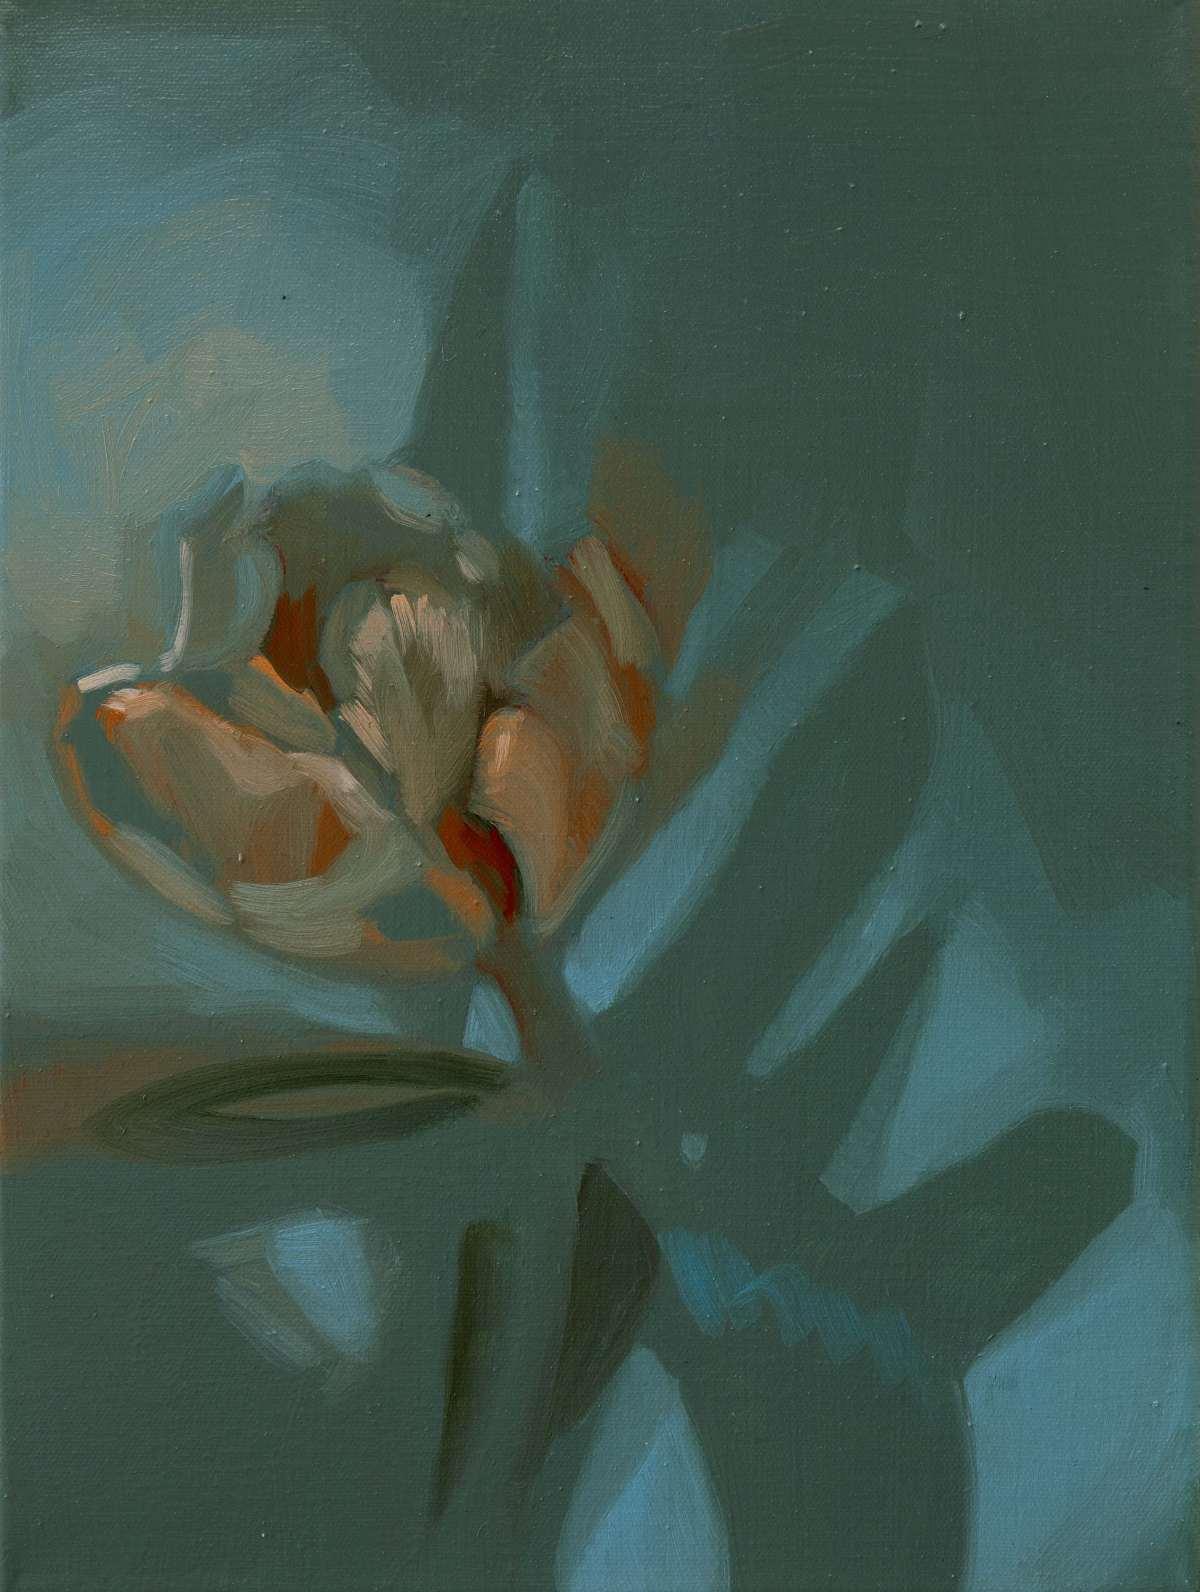 Bianca Regl, Innocent Forms (Tulips) / Azure, 2019